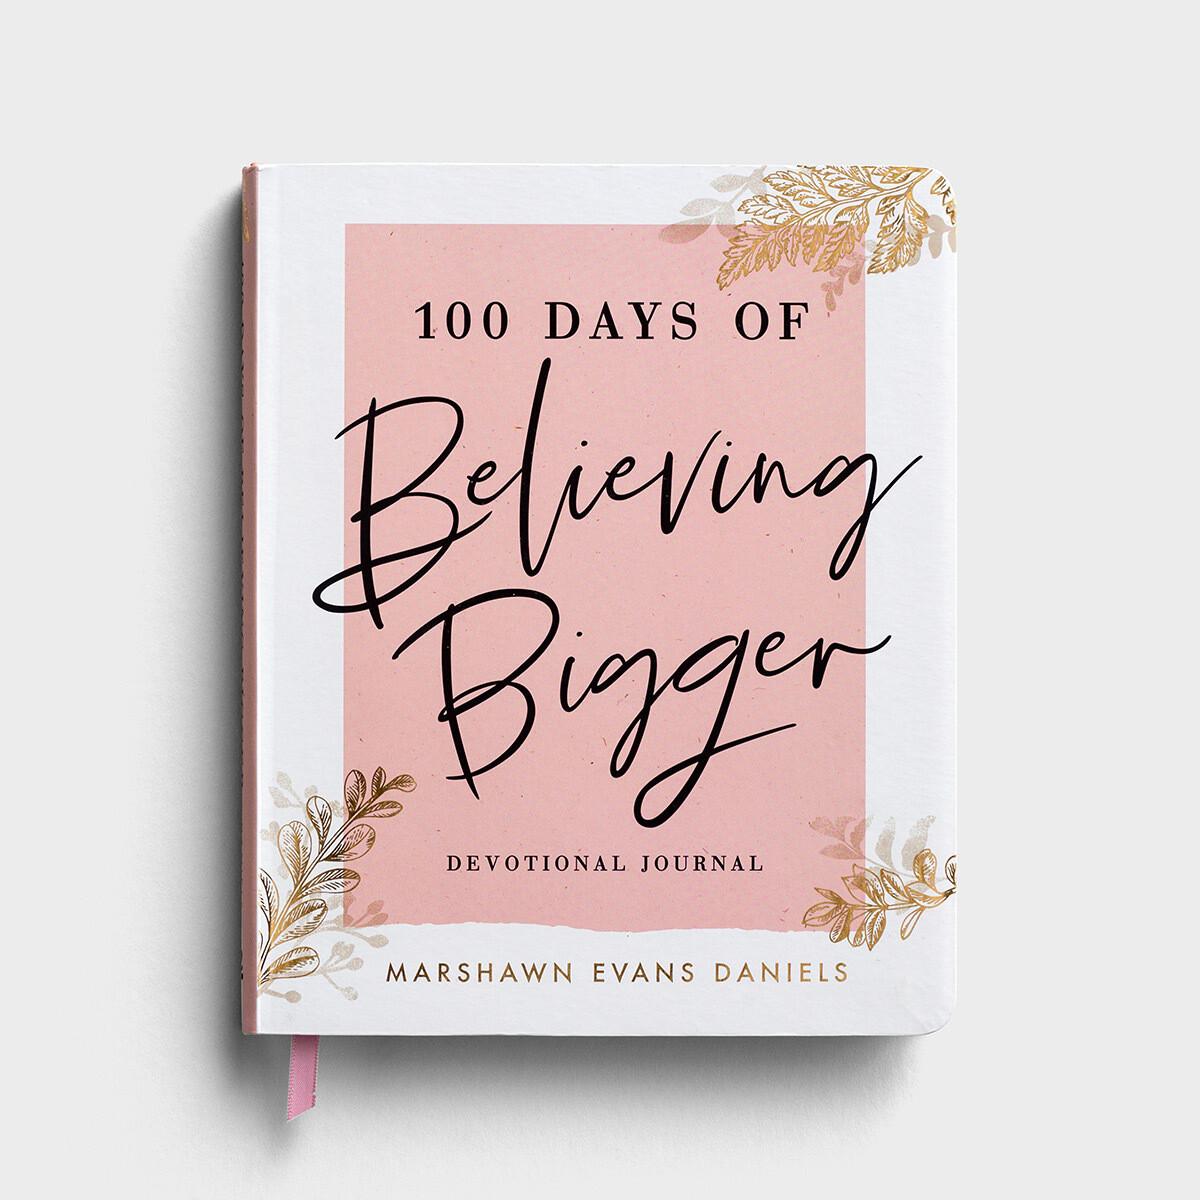 100 Days of Believing Bigger - Devotional Journal